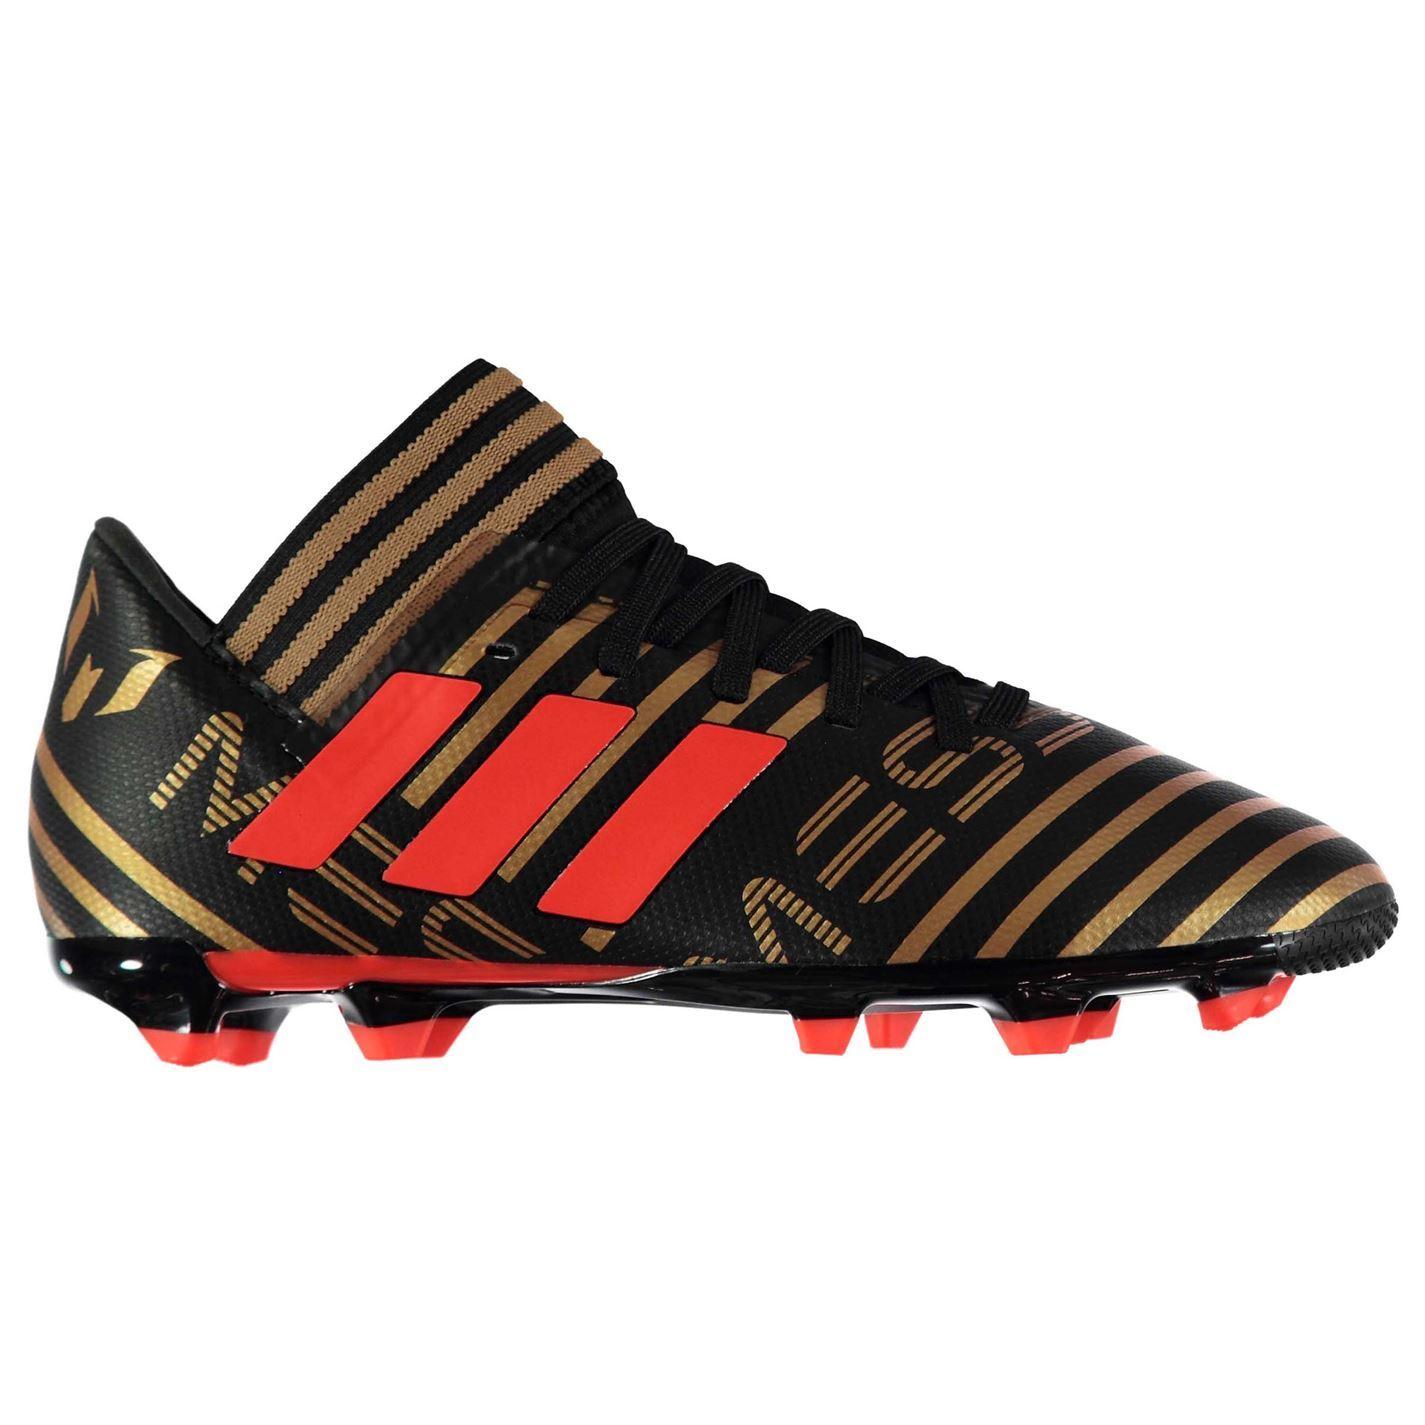 ... adidas Nemeziz Messi 17.3 FG Football Boots Childs Black Soccer Shoes  Cleats ... b219e913eb27d